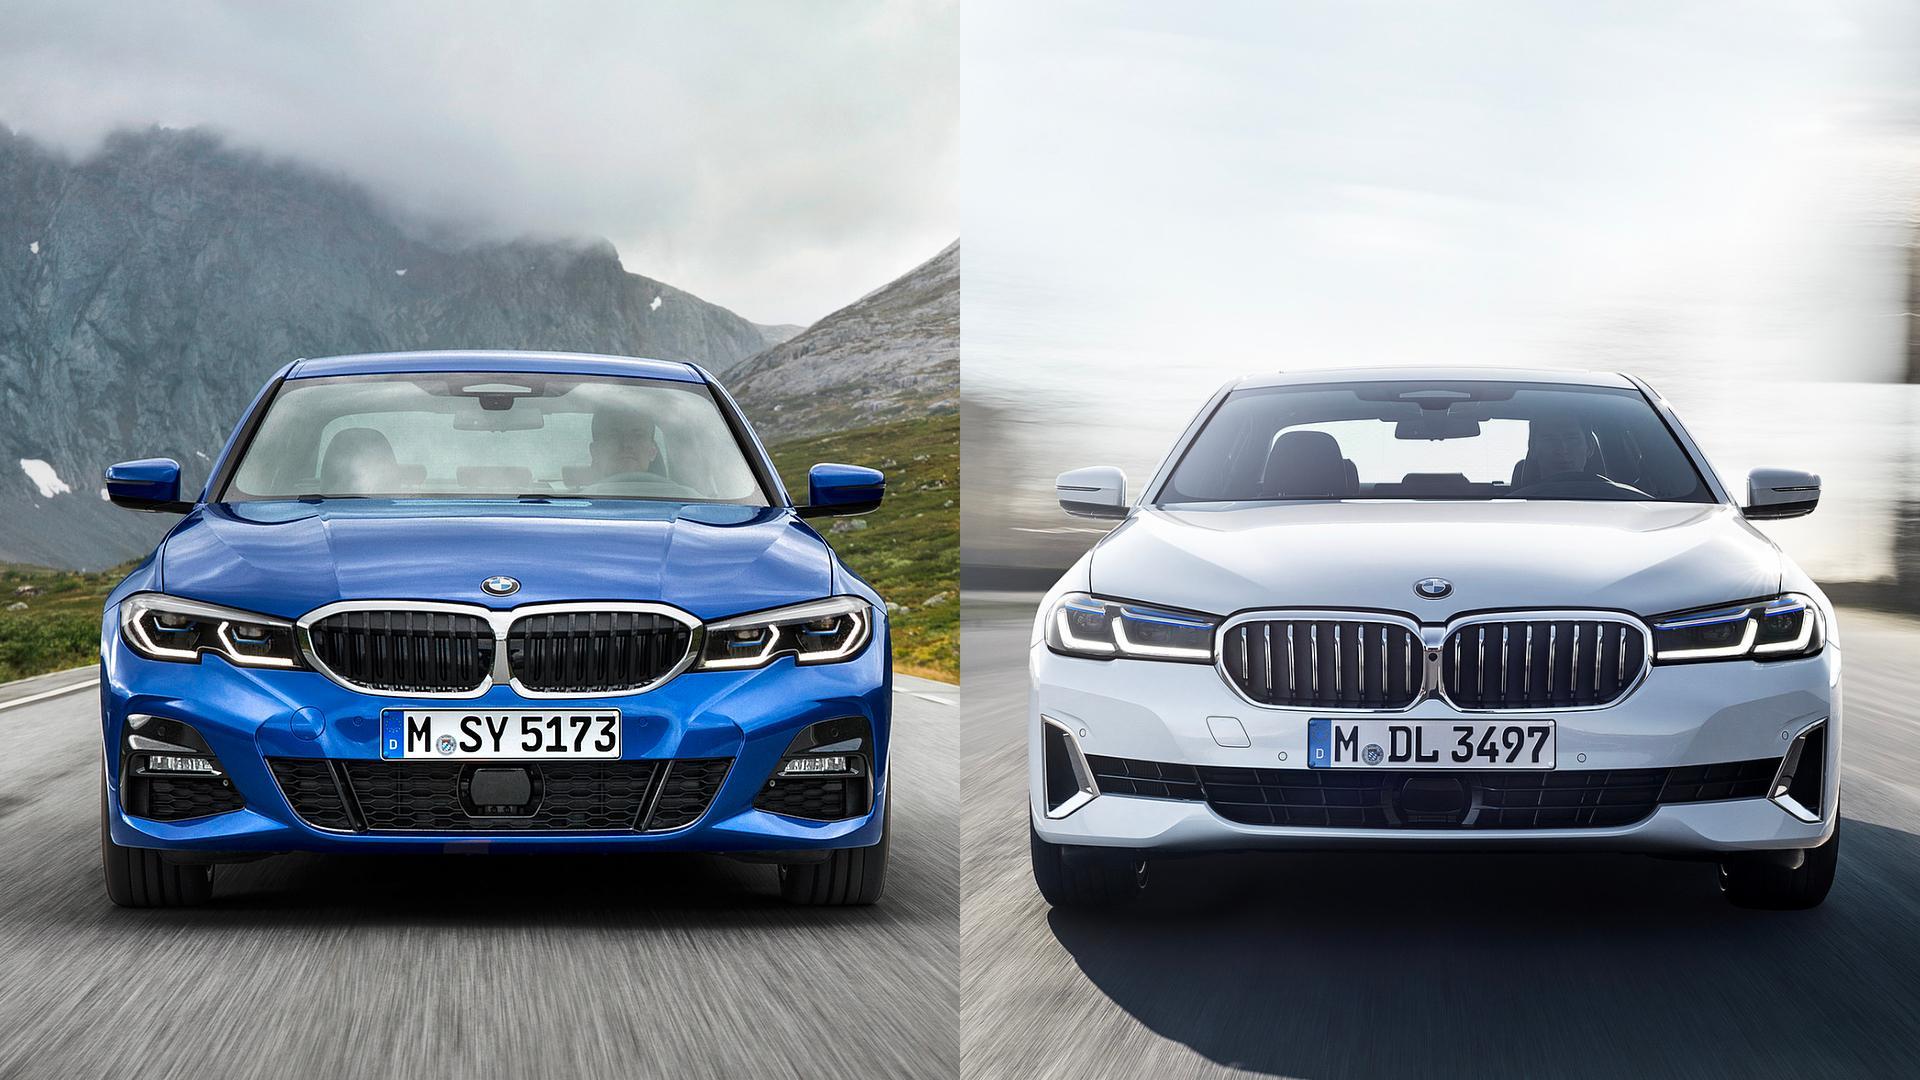 BMW 3 Series vs 5 Series